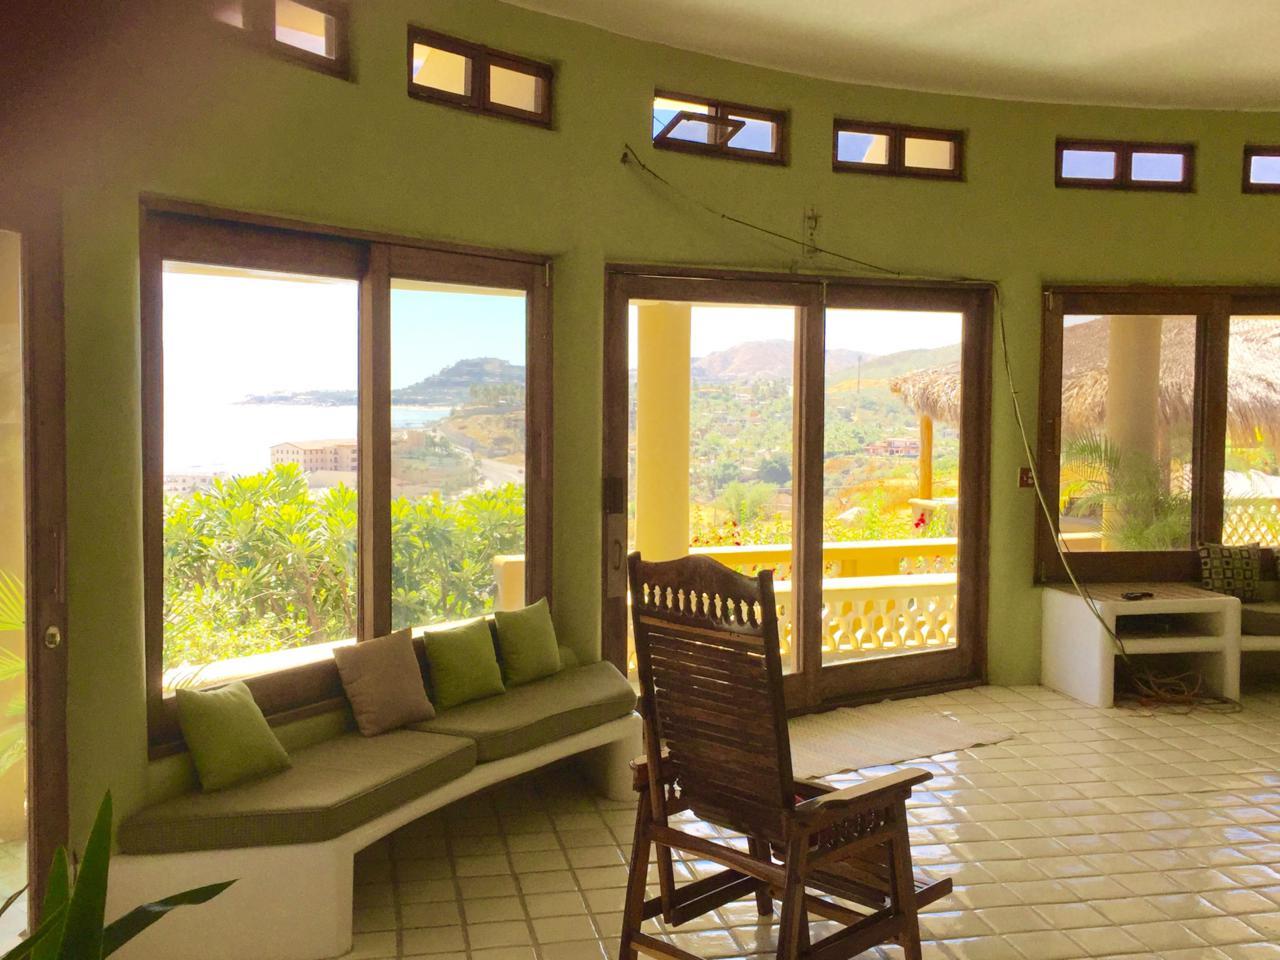 Arcoiris And Playa Blanca - Photo 1